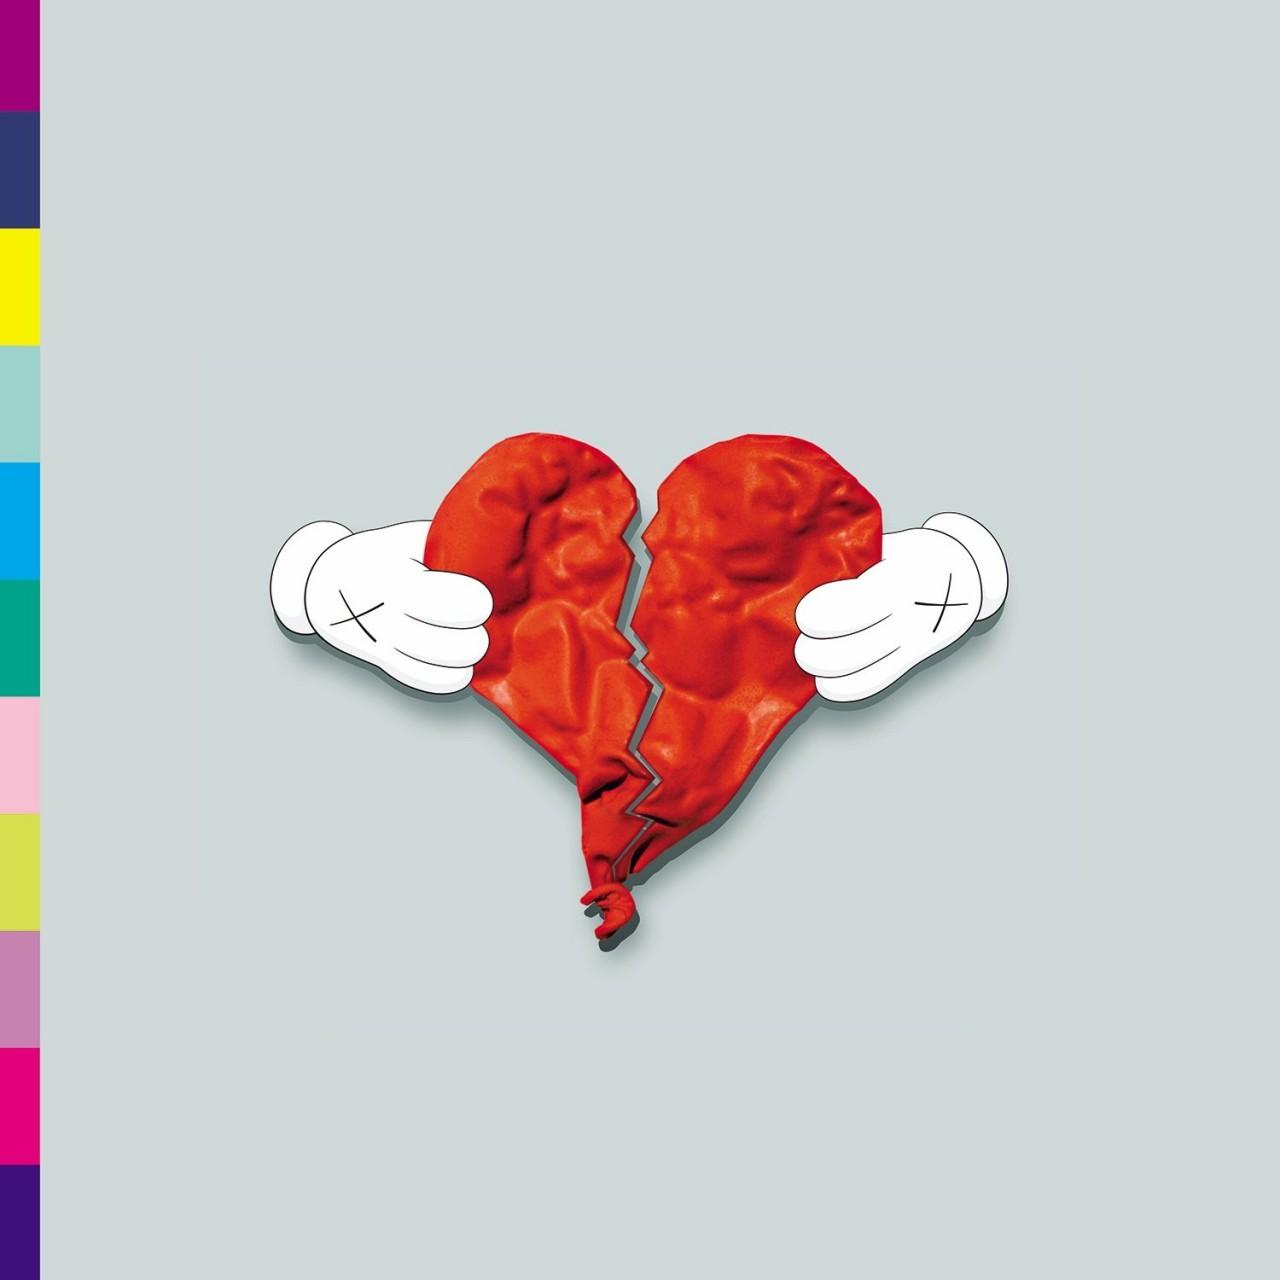 Kanye West - 808s & Heartbreak 2XLP + CD